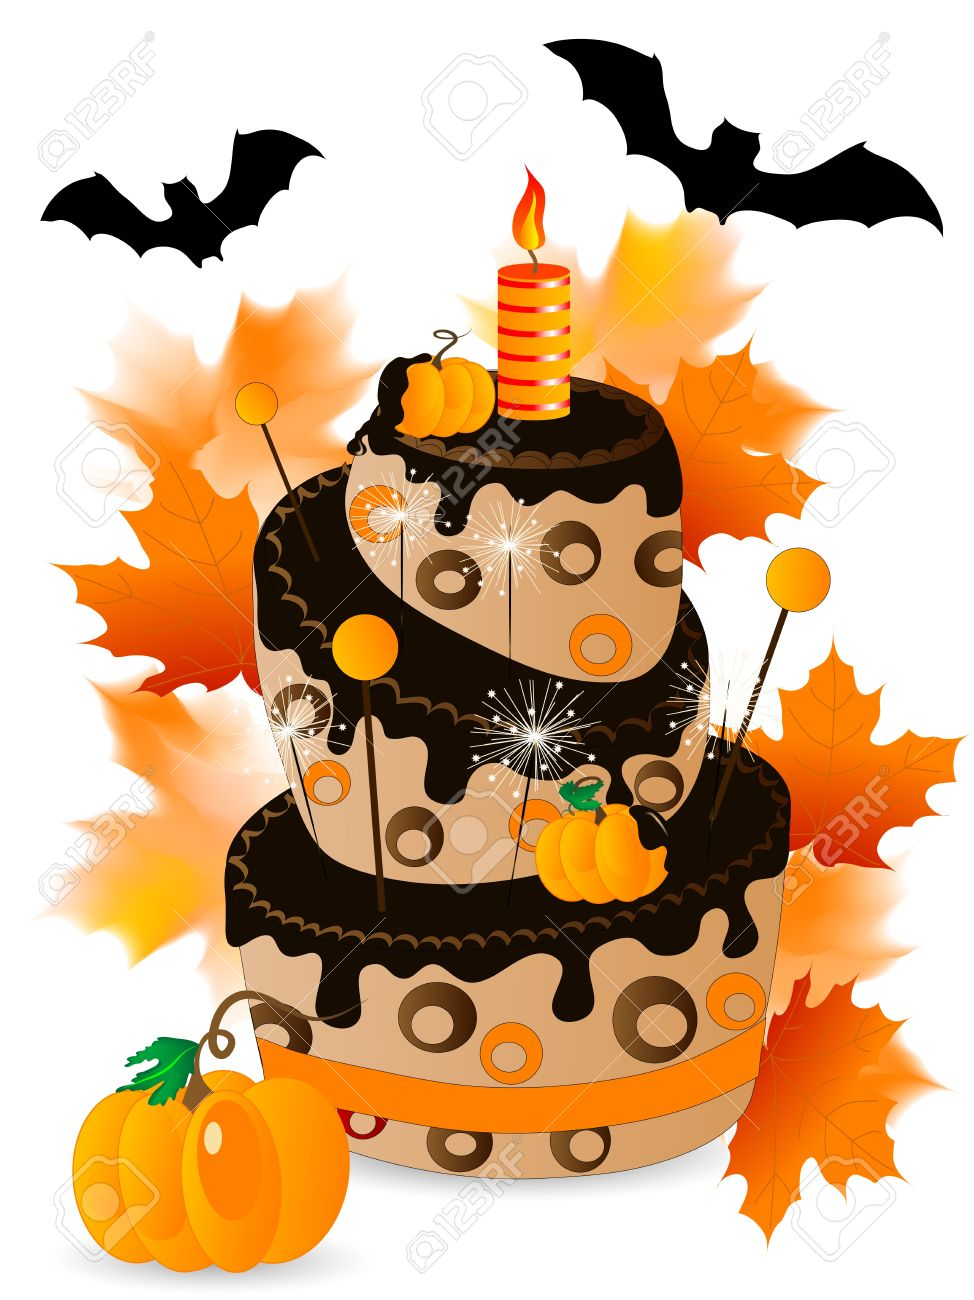 Halloween cake with chocolate, .